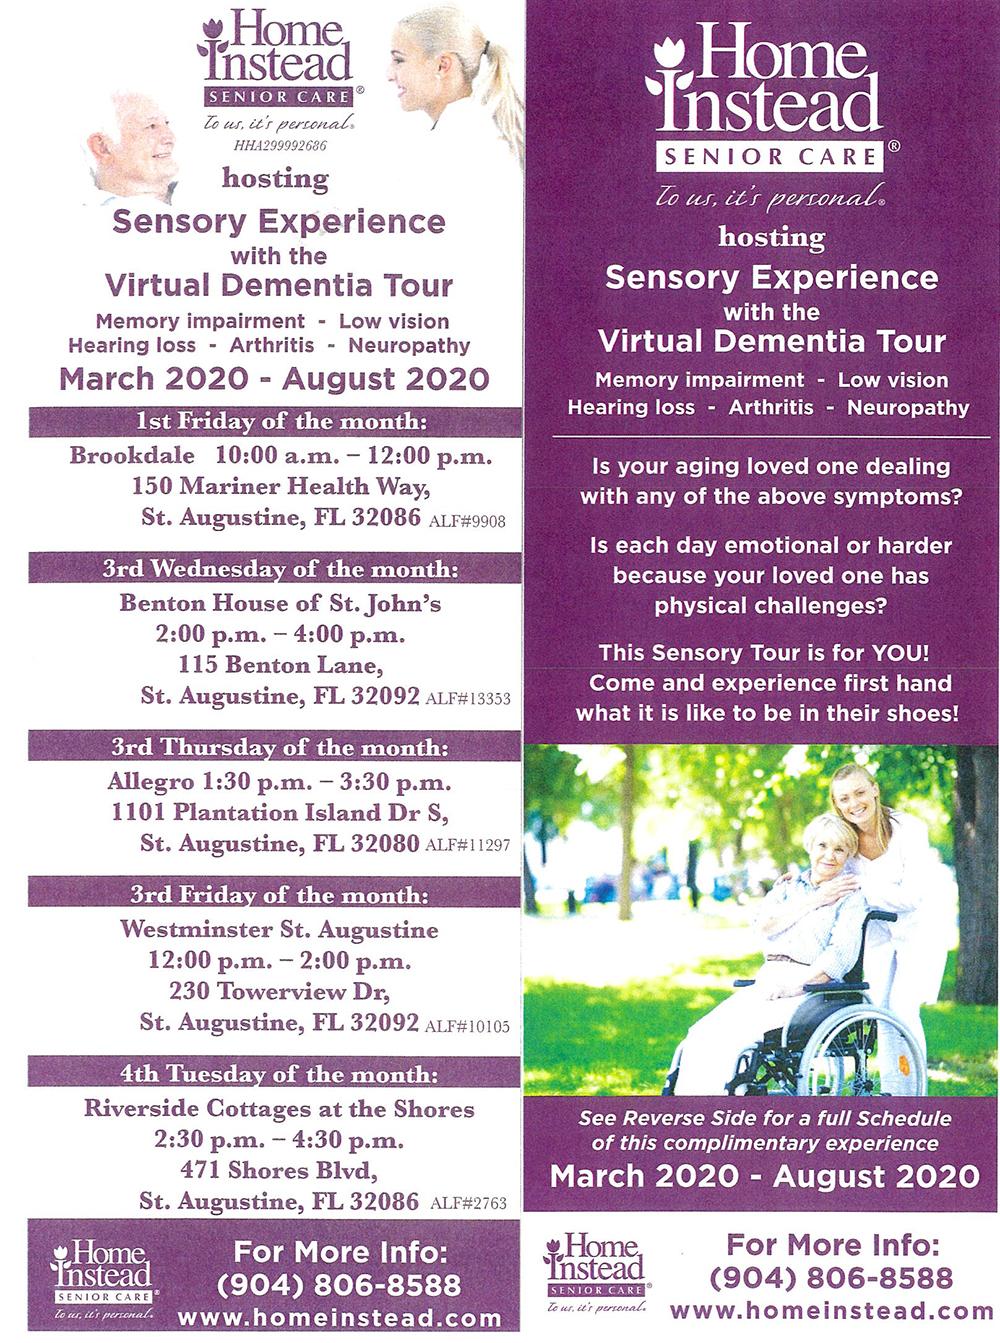 Home Instead Virtual Dementia Tour Flyer